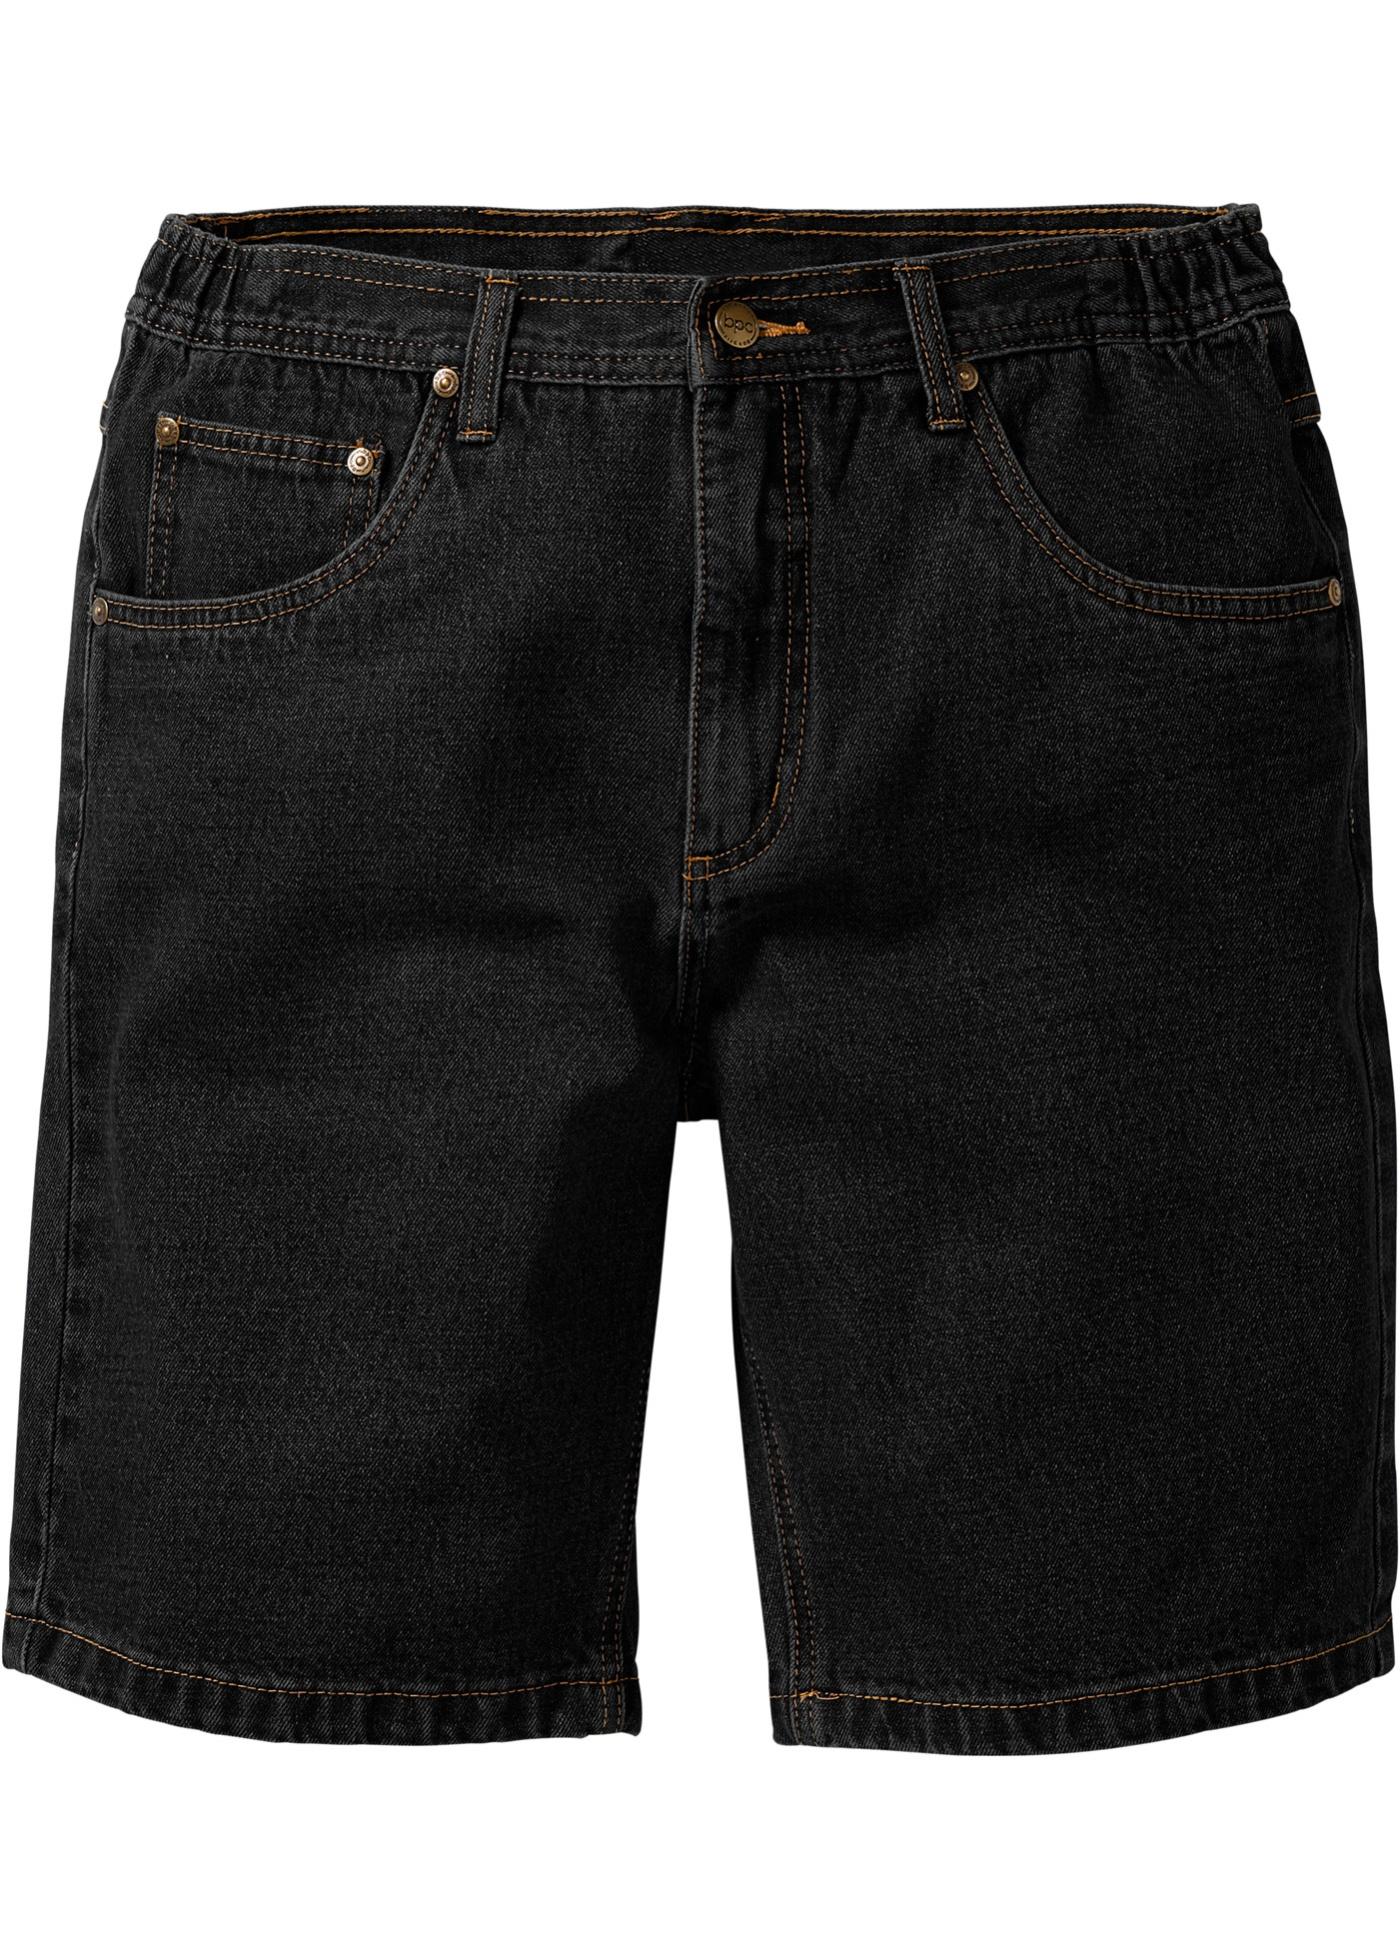 Bermuda di jeans classic fit (Nero) - John Baner JEANSWEAR (2473050485)